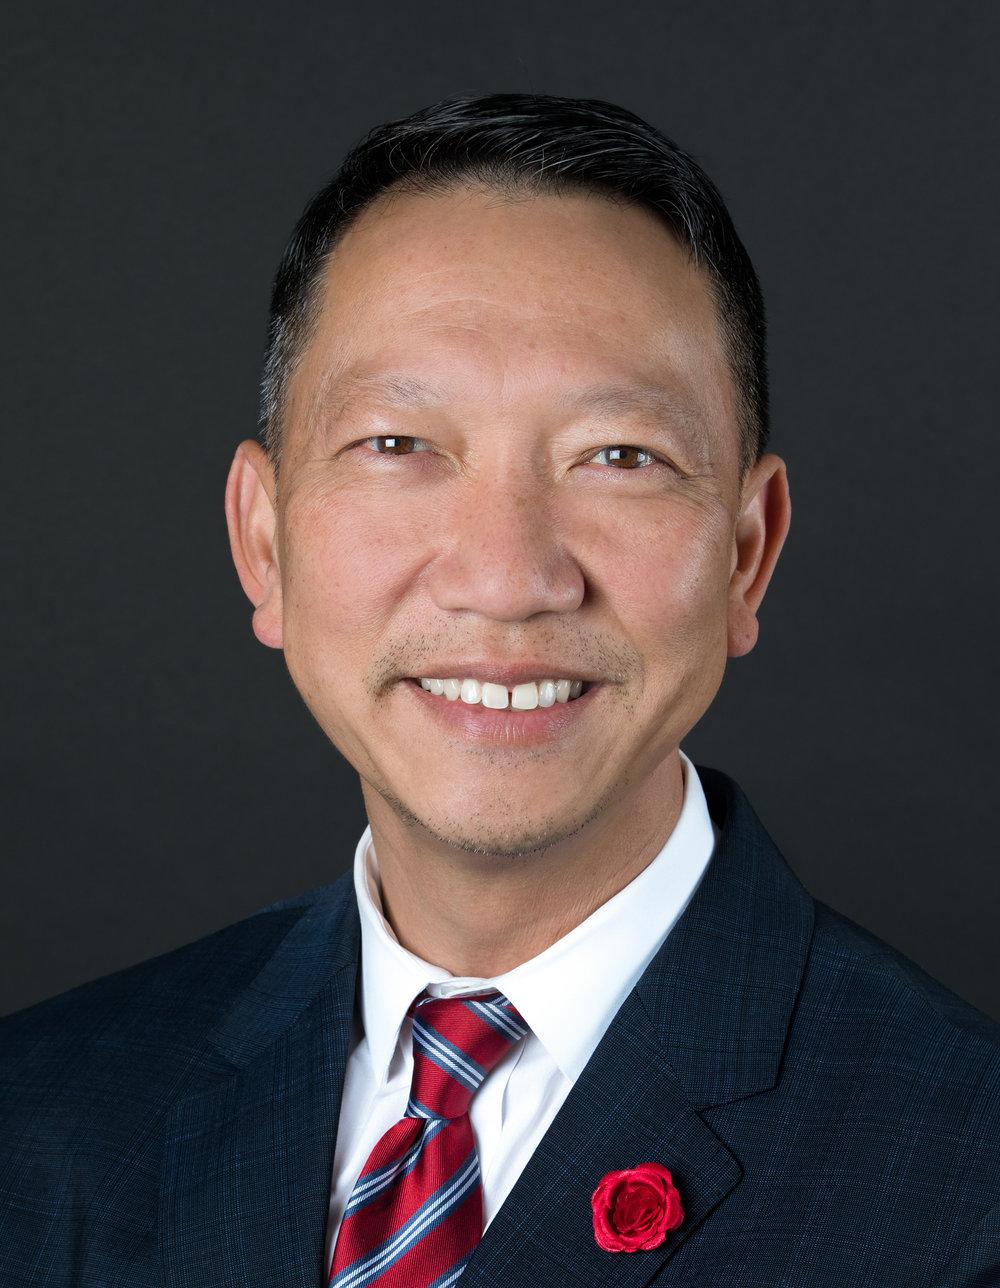 Sonny Chan - New Headshot.jpg